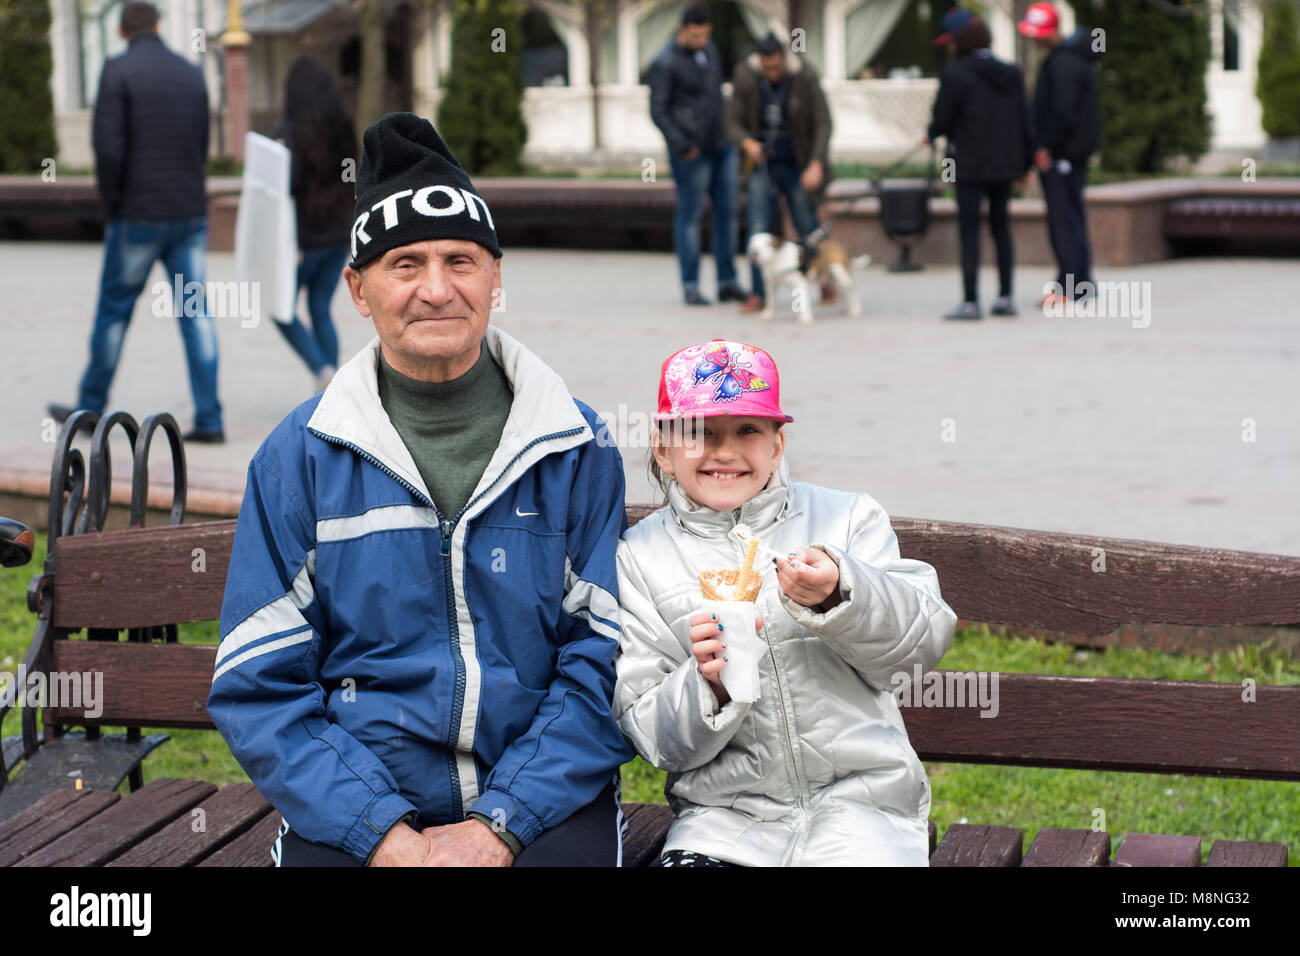 Grandpa and granddaughter. City of Ivano-Frankivsk, Uraine. April 23, 2017 - Stock Image